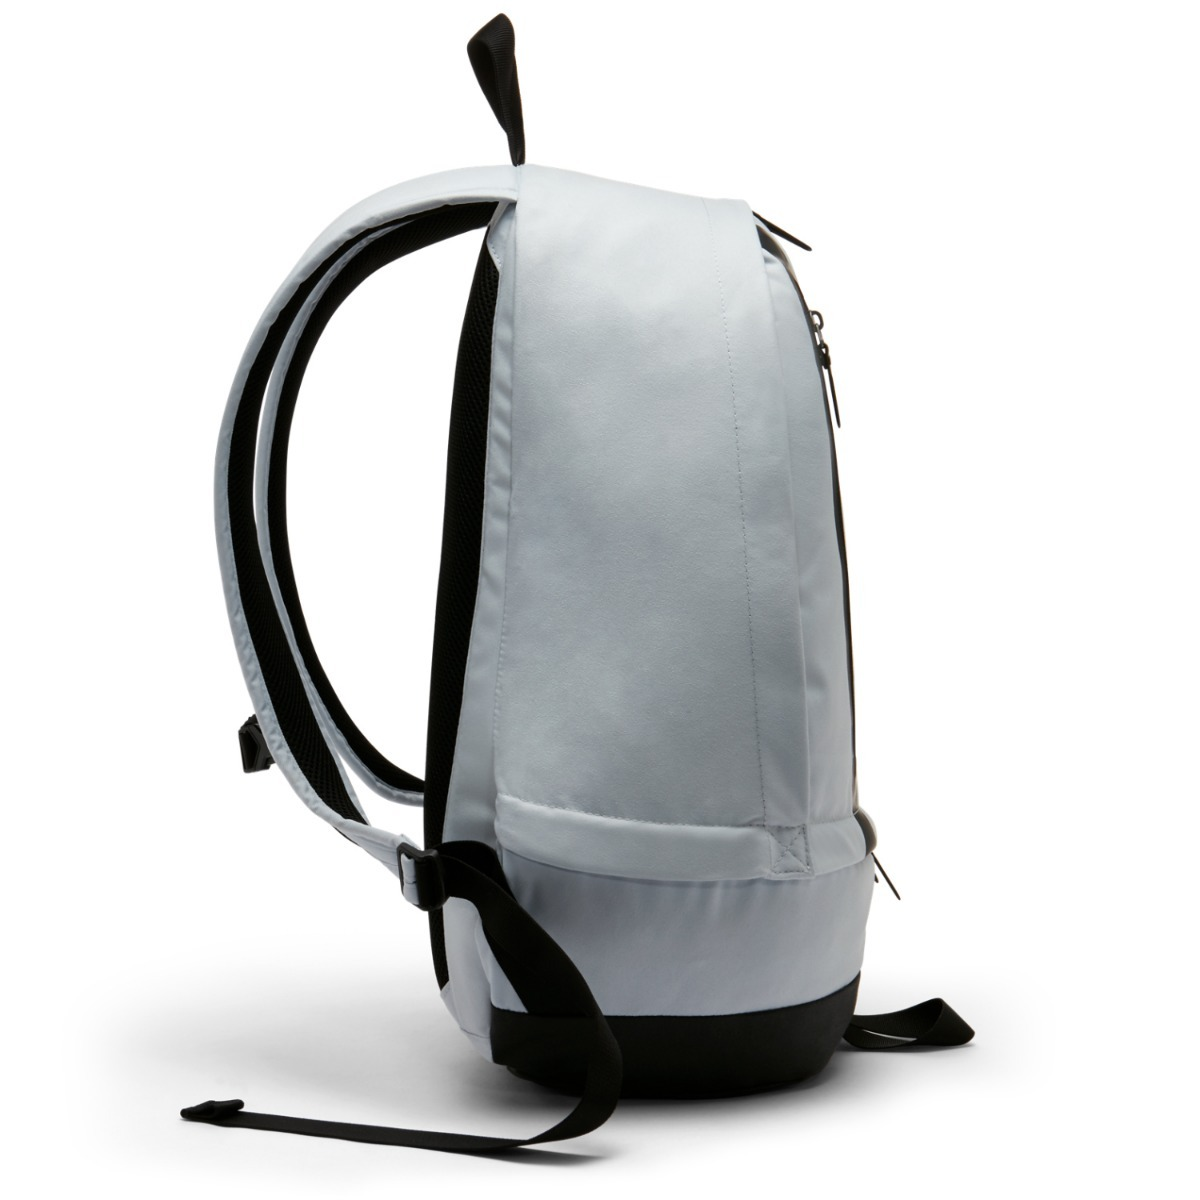 Mochilas Nike Cr7 Cheyenne Soccer Backpack